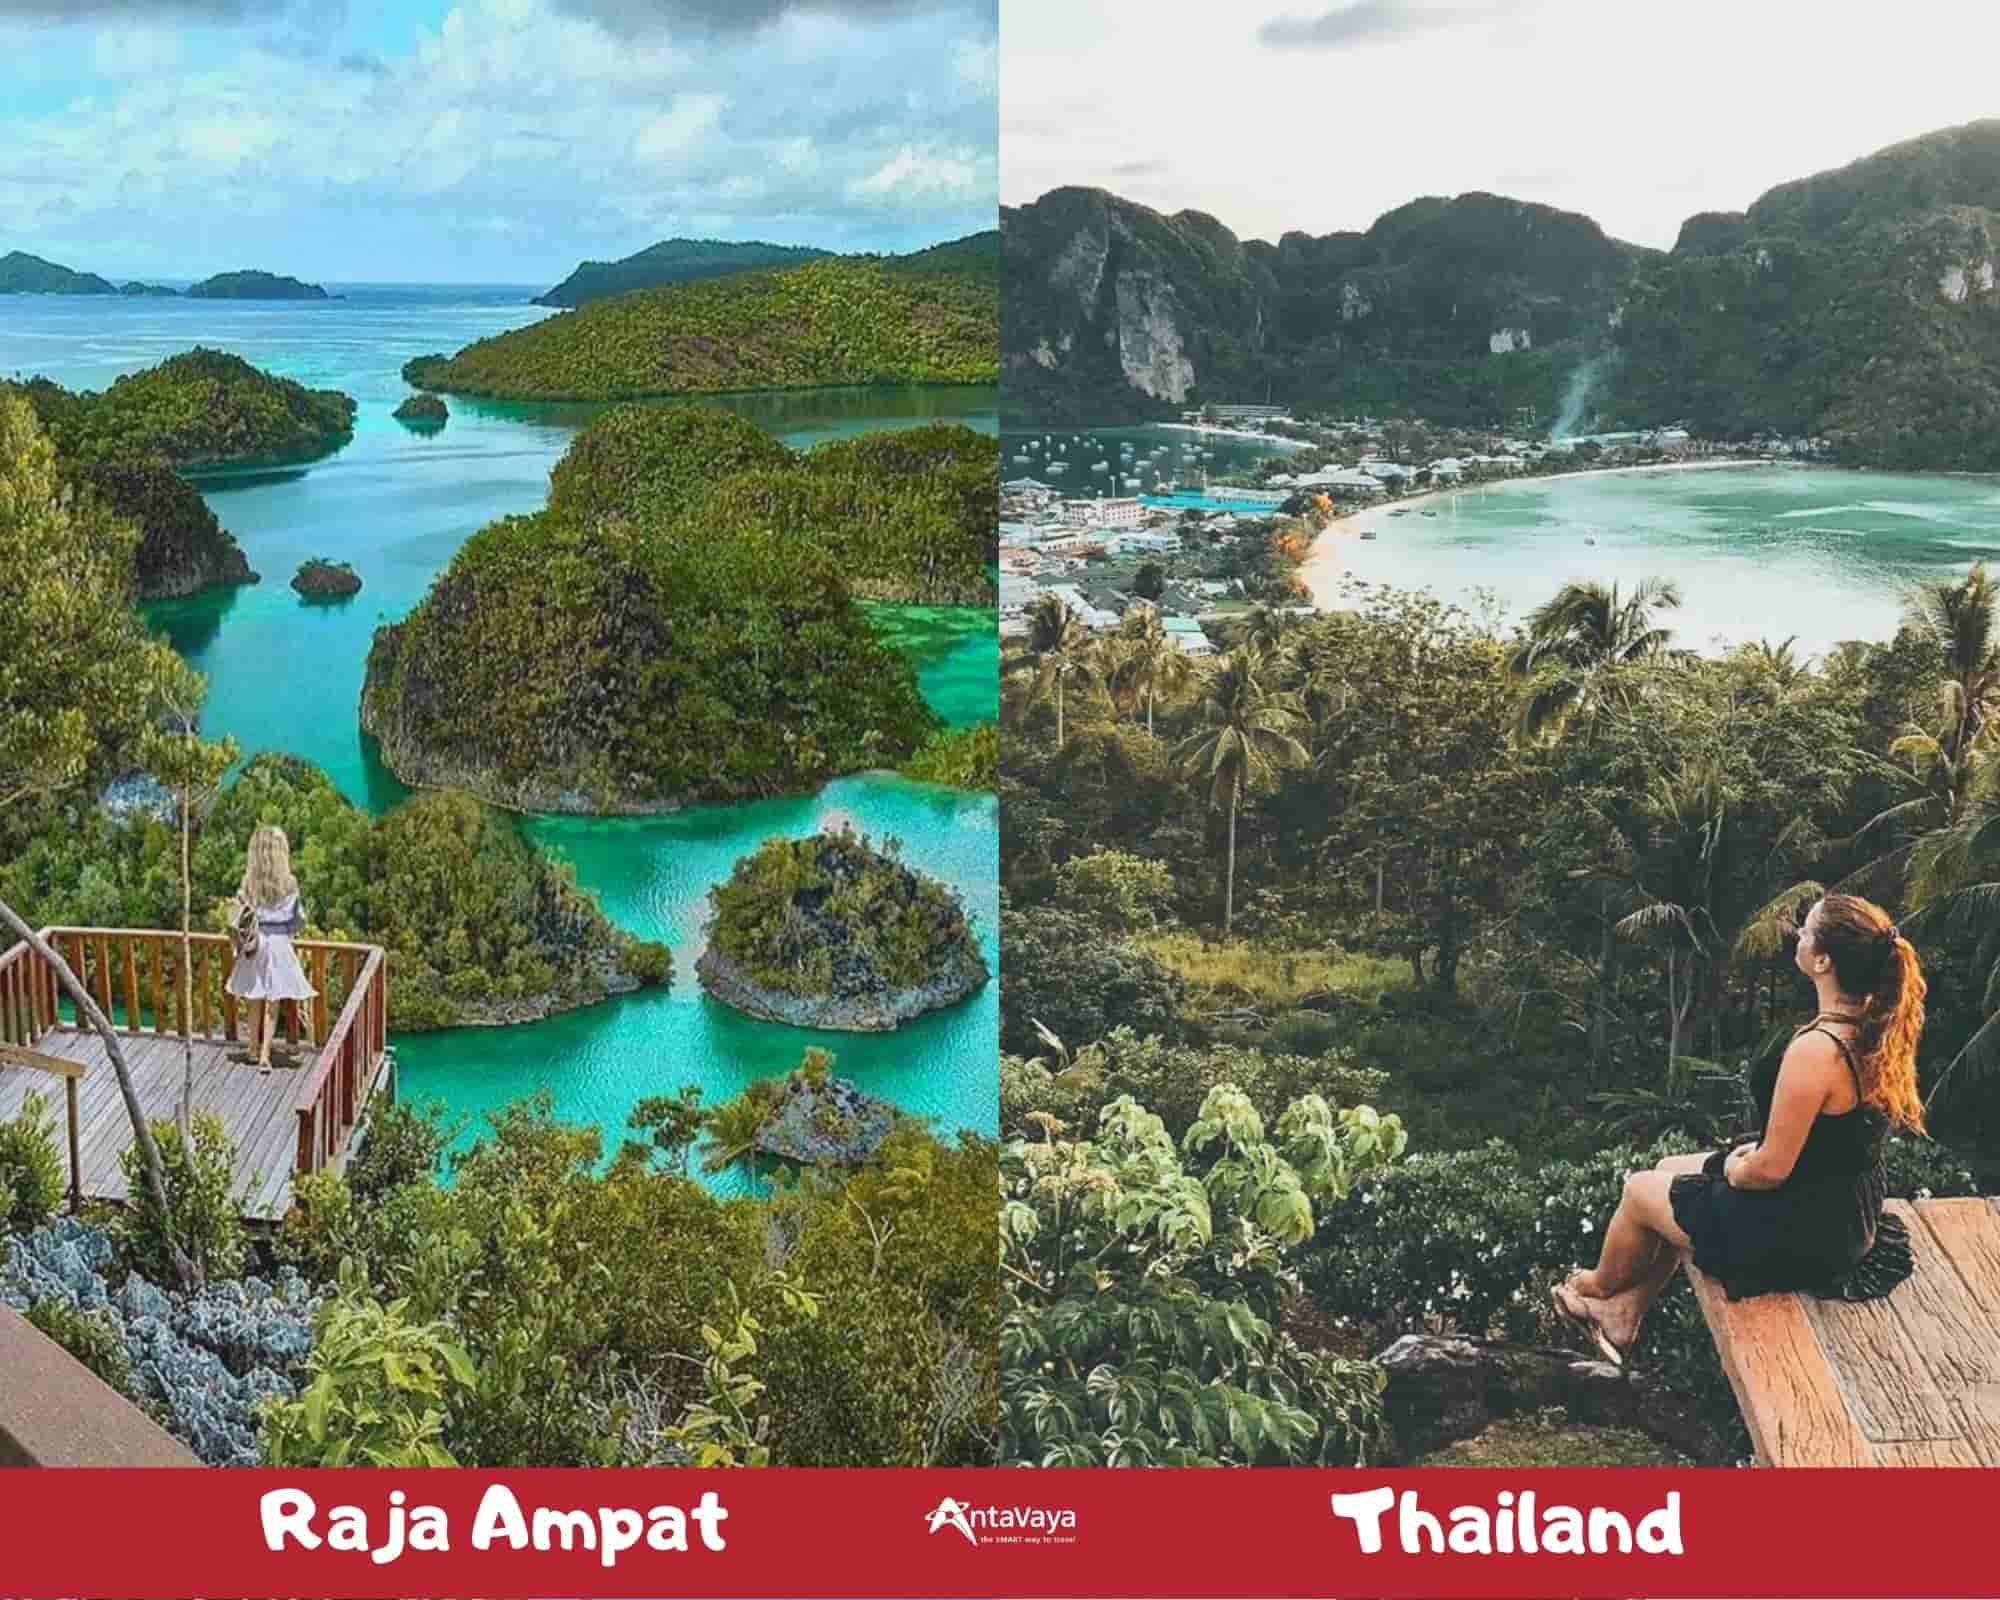 Spot Destinasi Indonesia Mirip Luar Negeri - Sumber Instagram blonde.travel dan kyratamminga